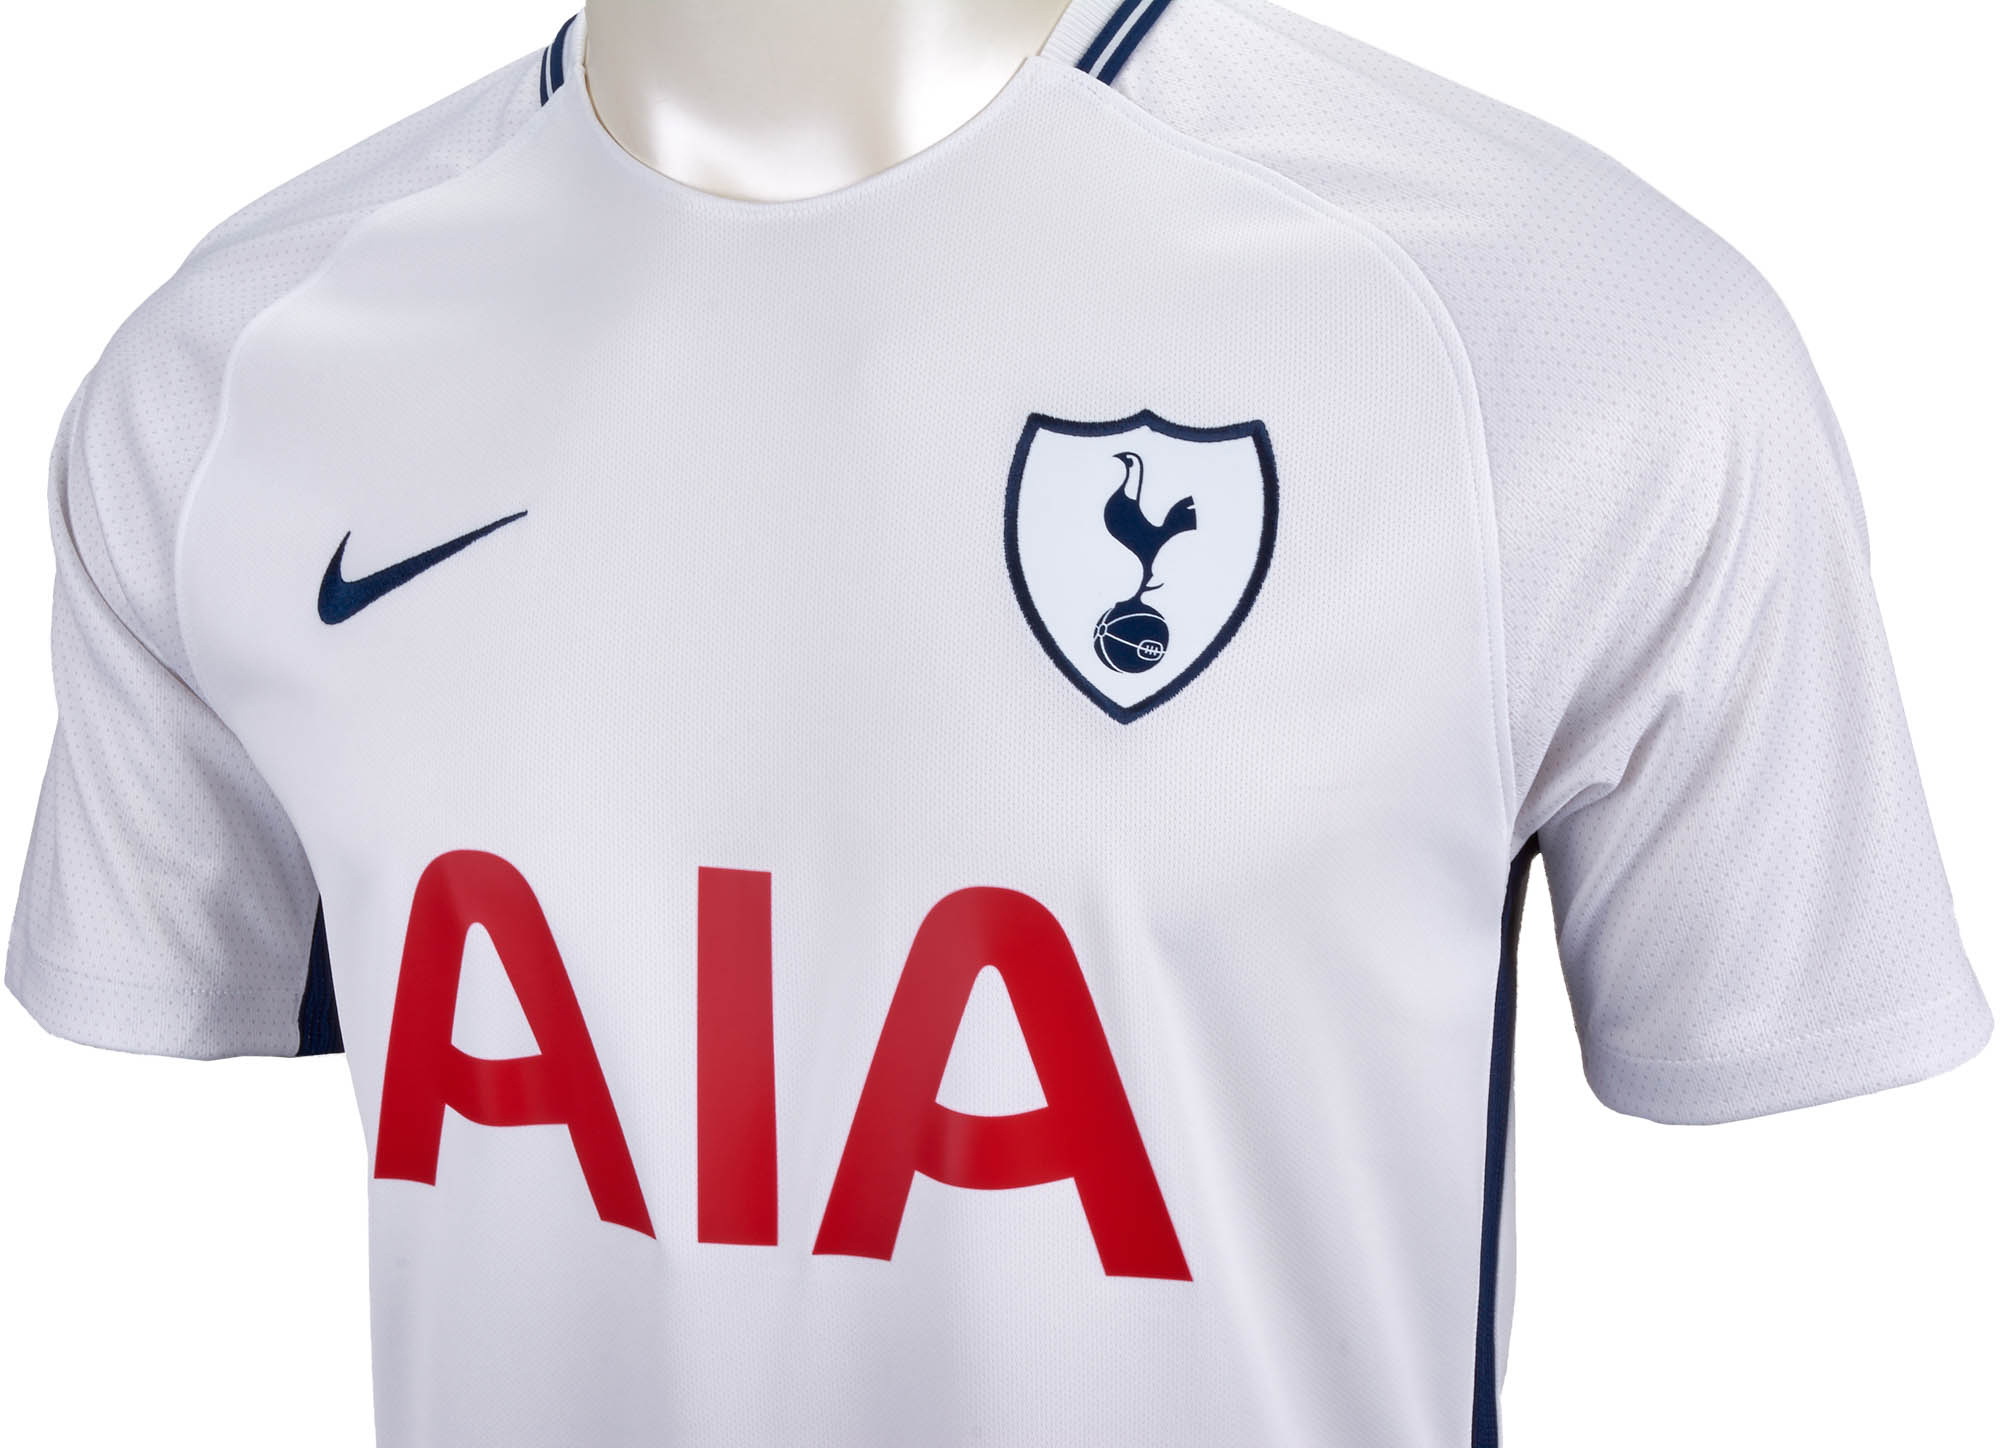 Nike Tottenham Home Jersey - 2017/18 Tottenham Jerseys